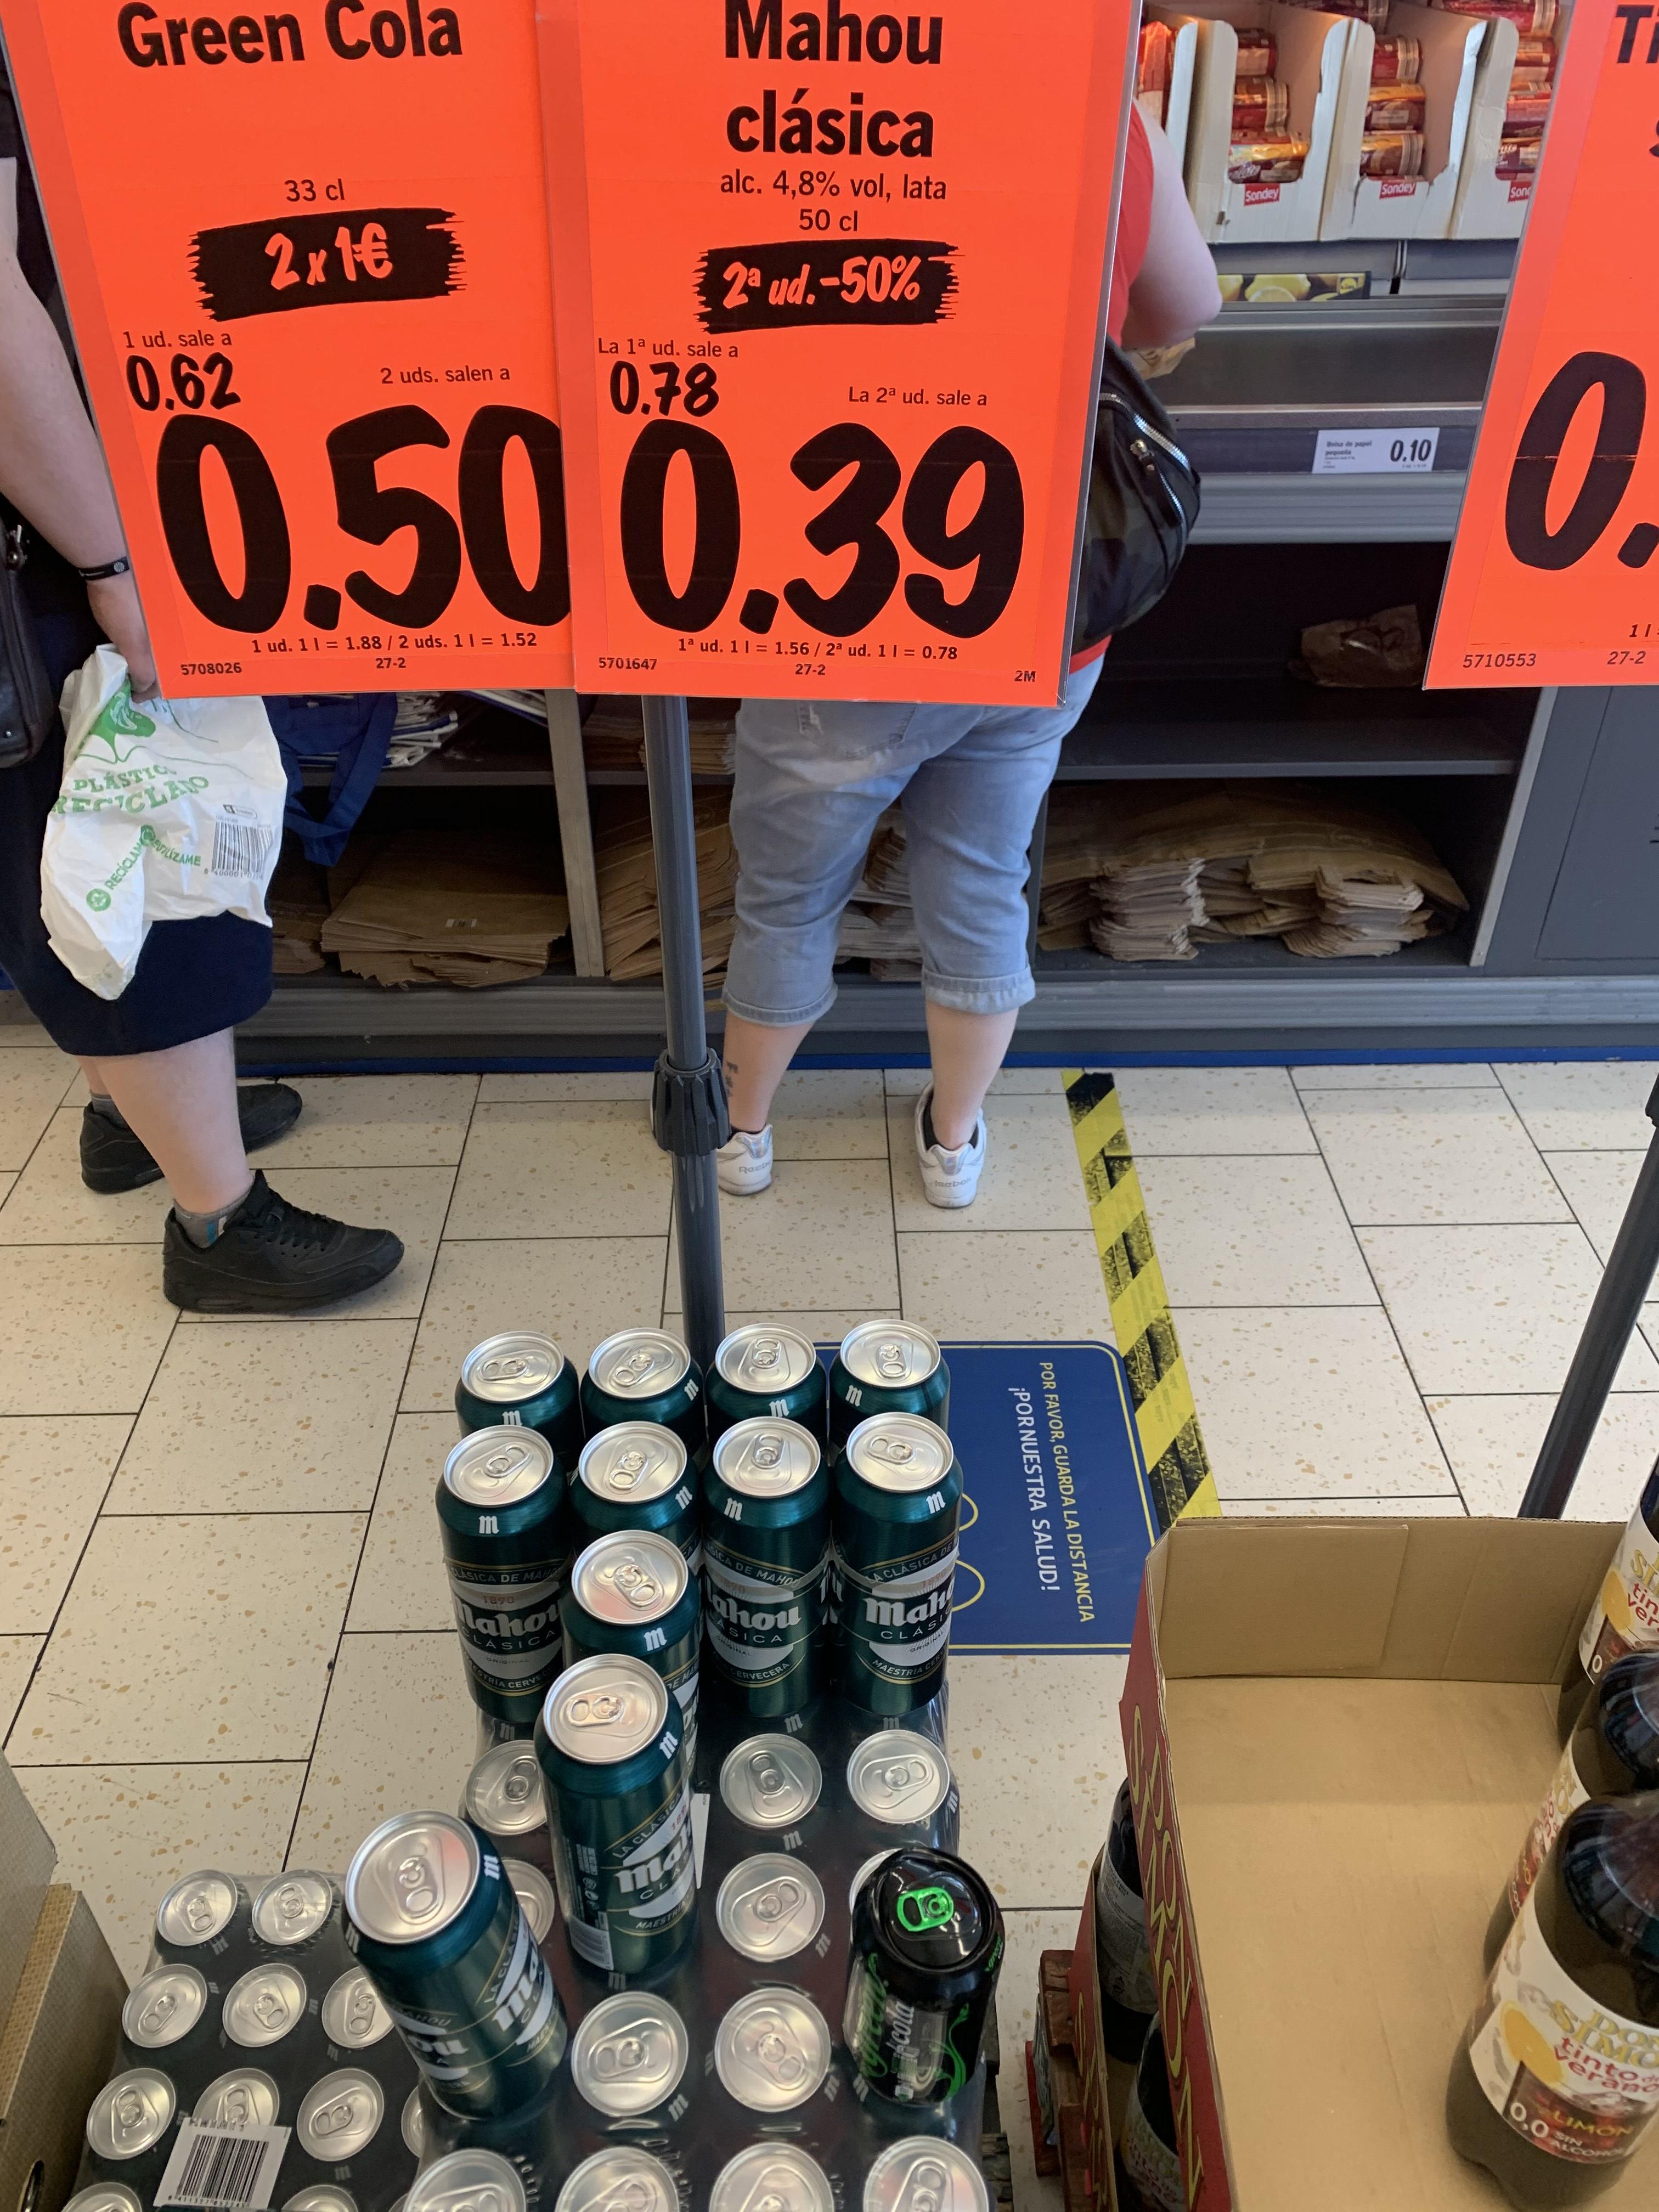 Mahou clásica 1,17€ el litro